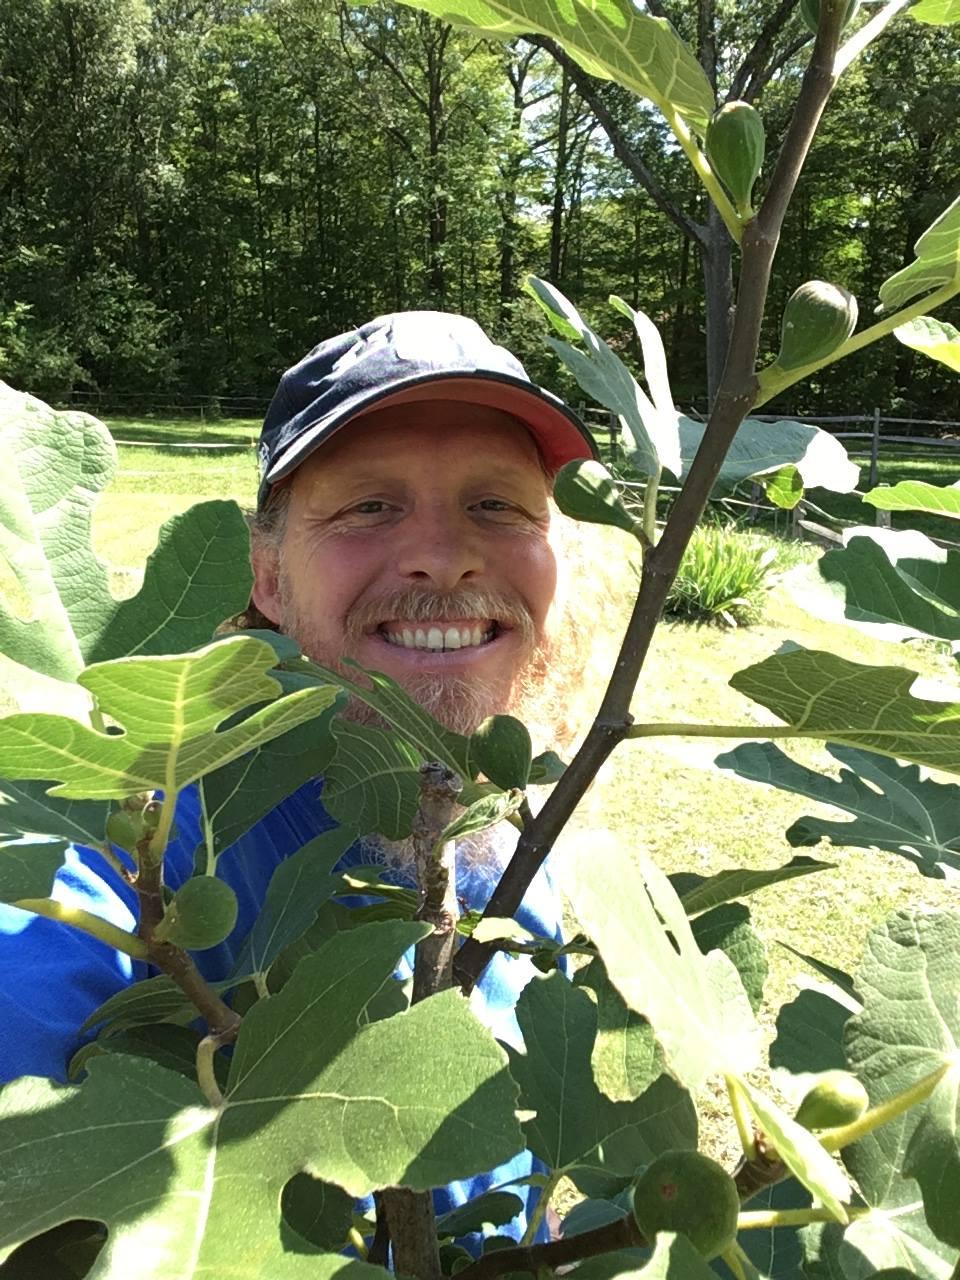 A happy gardener